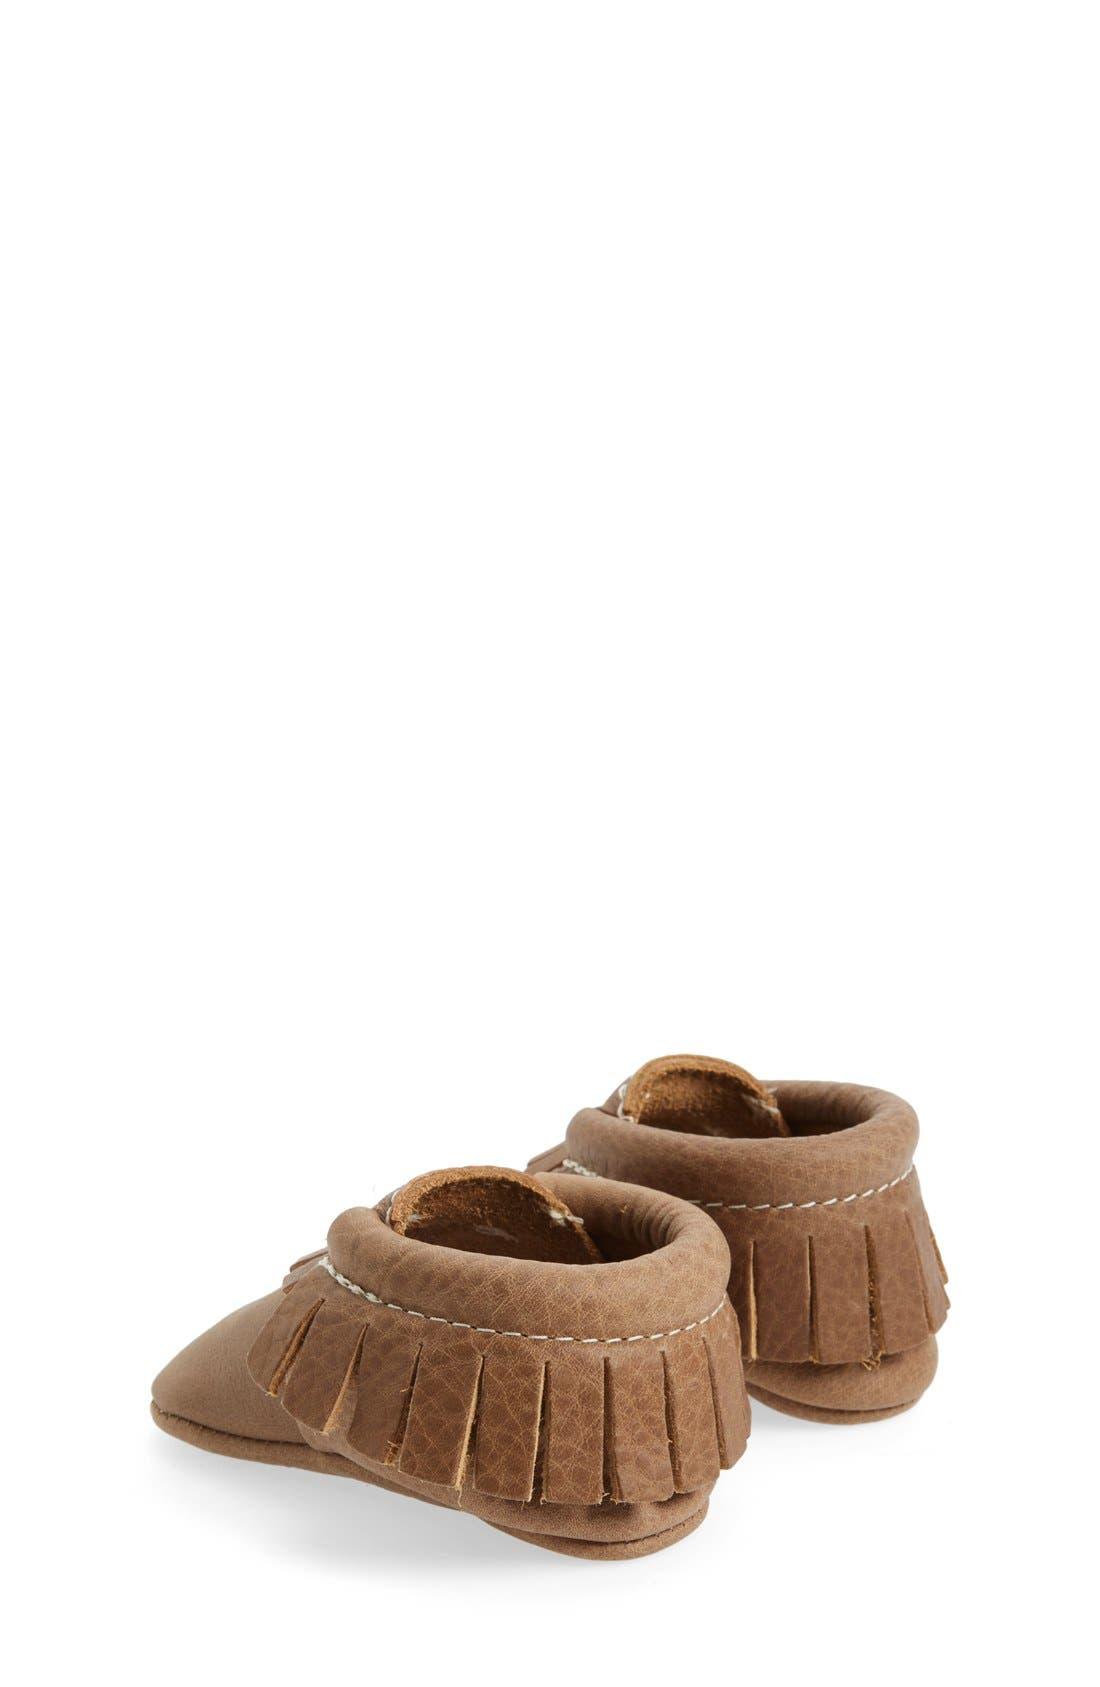 Alternate Image 2  - Freshly Picked Leather Moccasin (Baby & Walker)